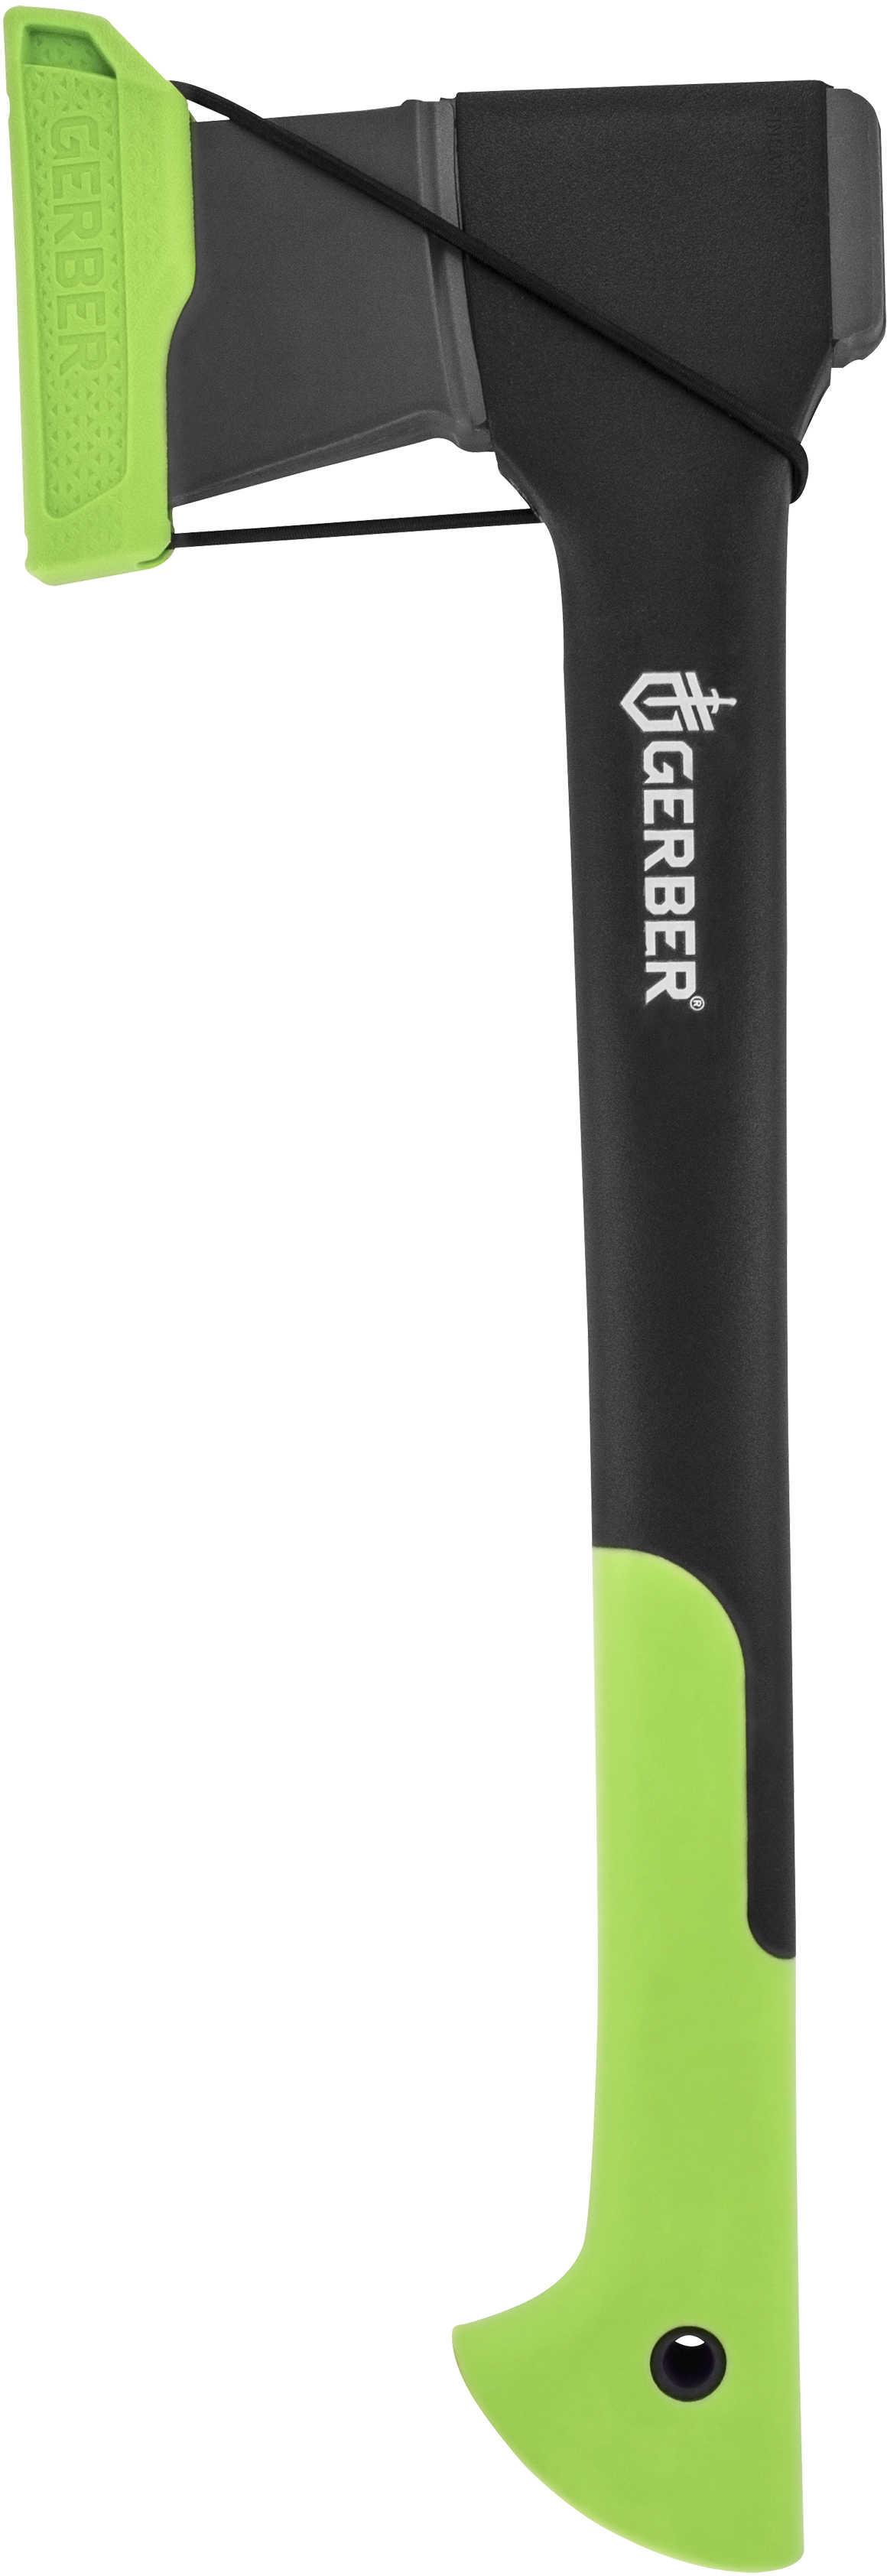 Gerber Blades GERBER Sport Axe II Md: 31-002647